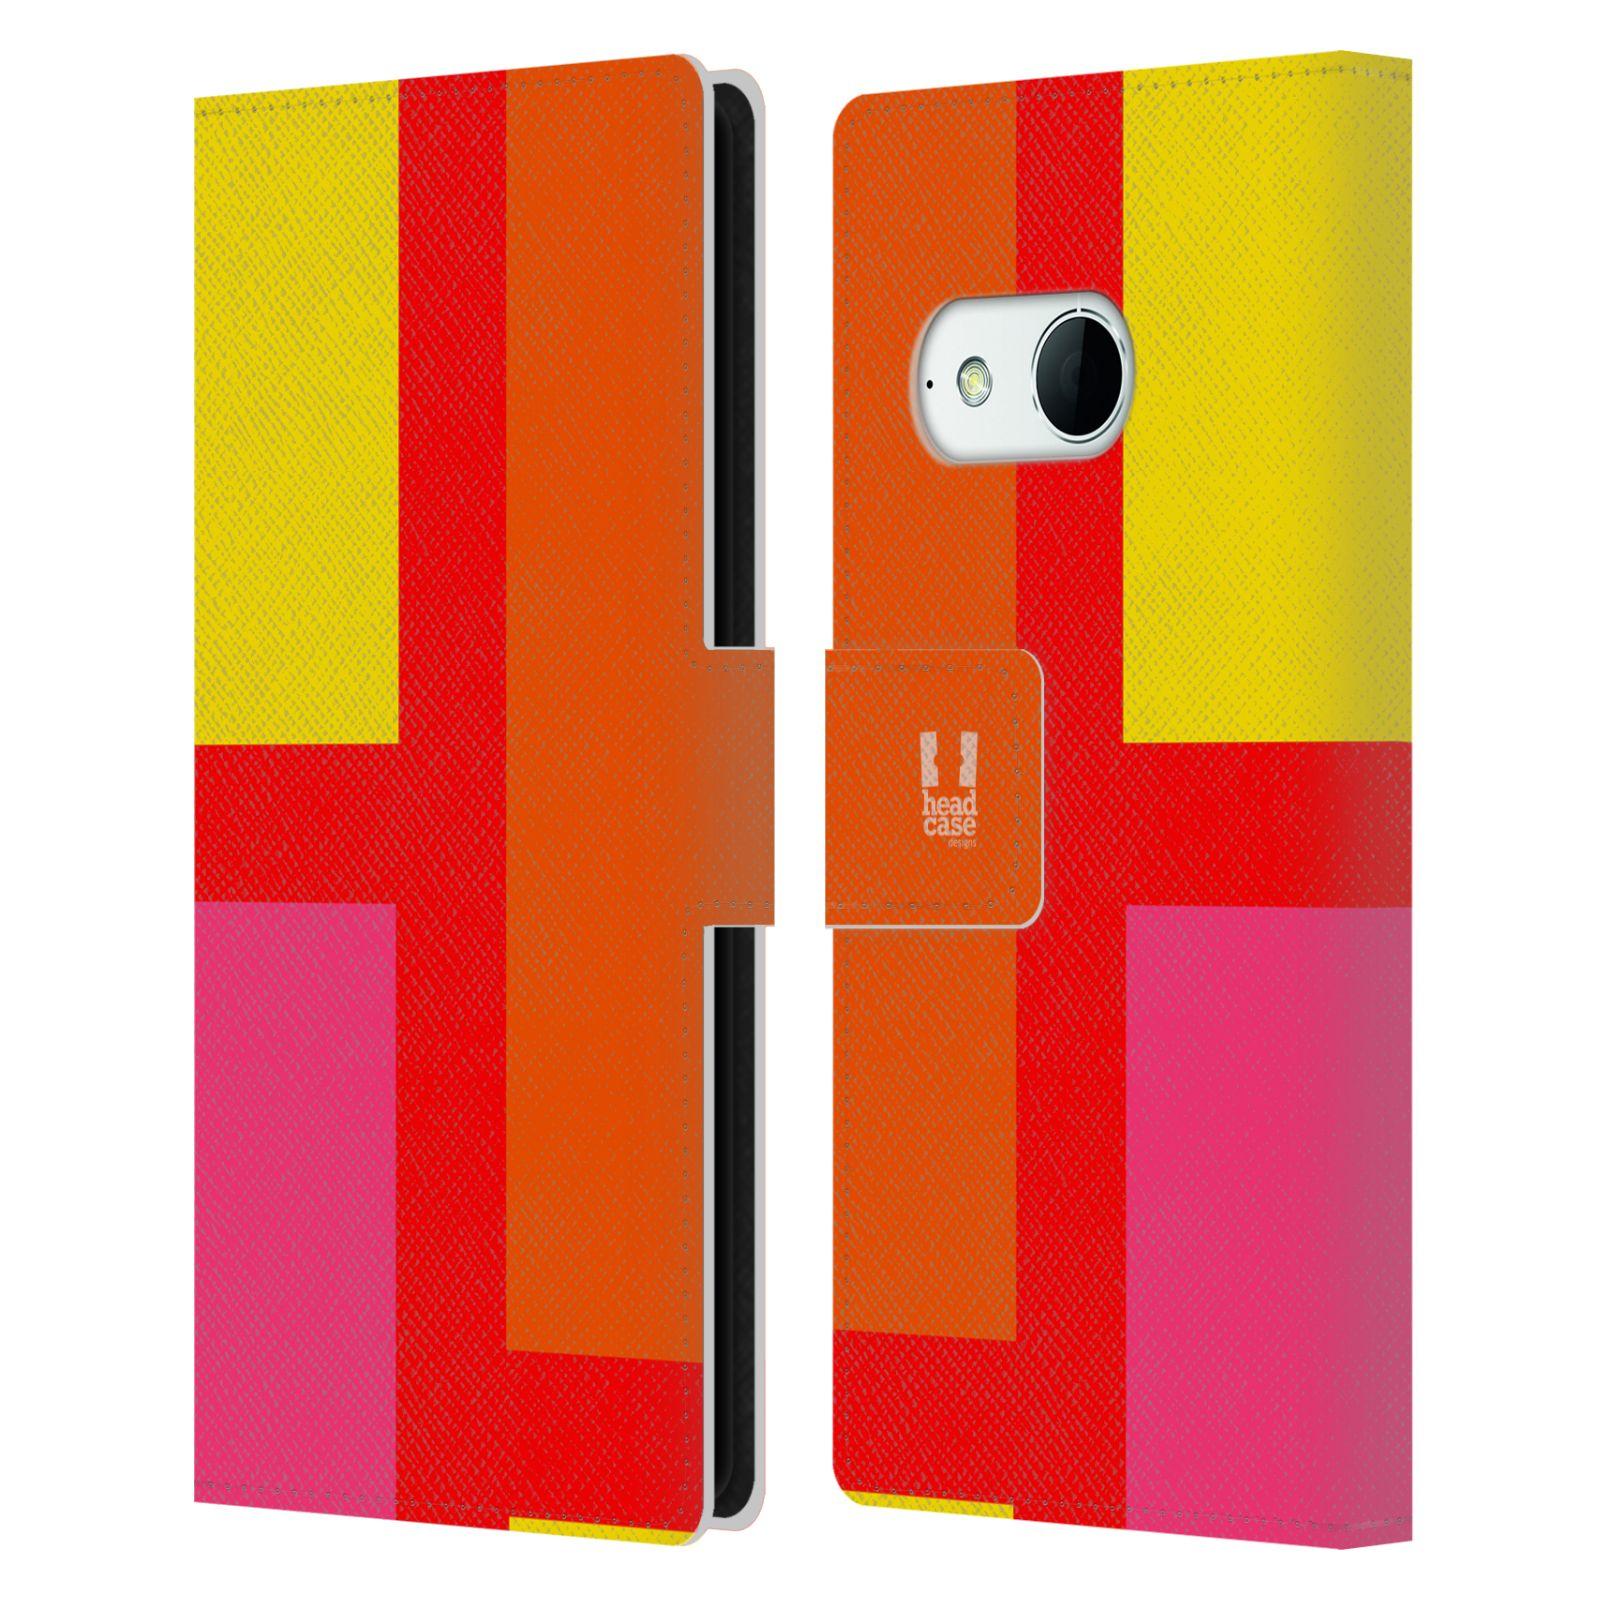 HEAD CASE Flipové pouzdro pro mobil HTC ONE MINI 2 barevné tvary oranžová ulice